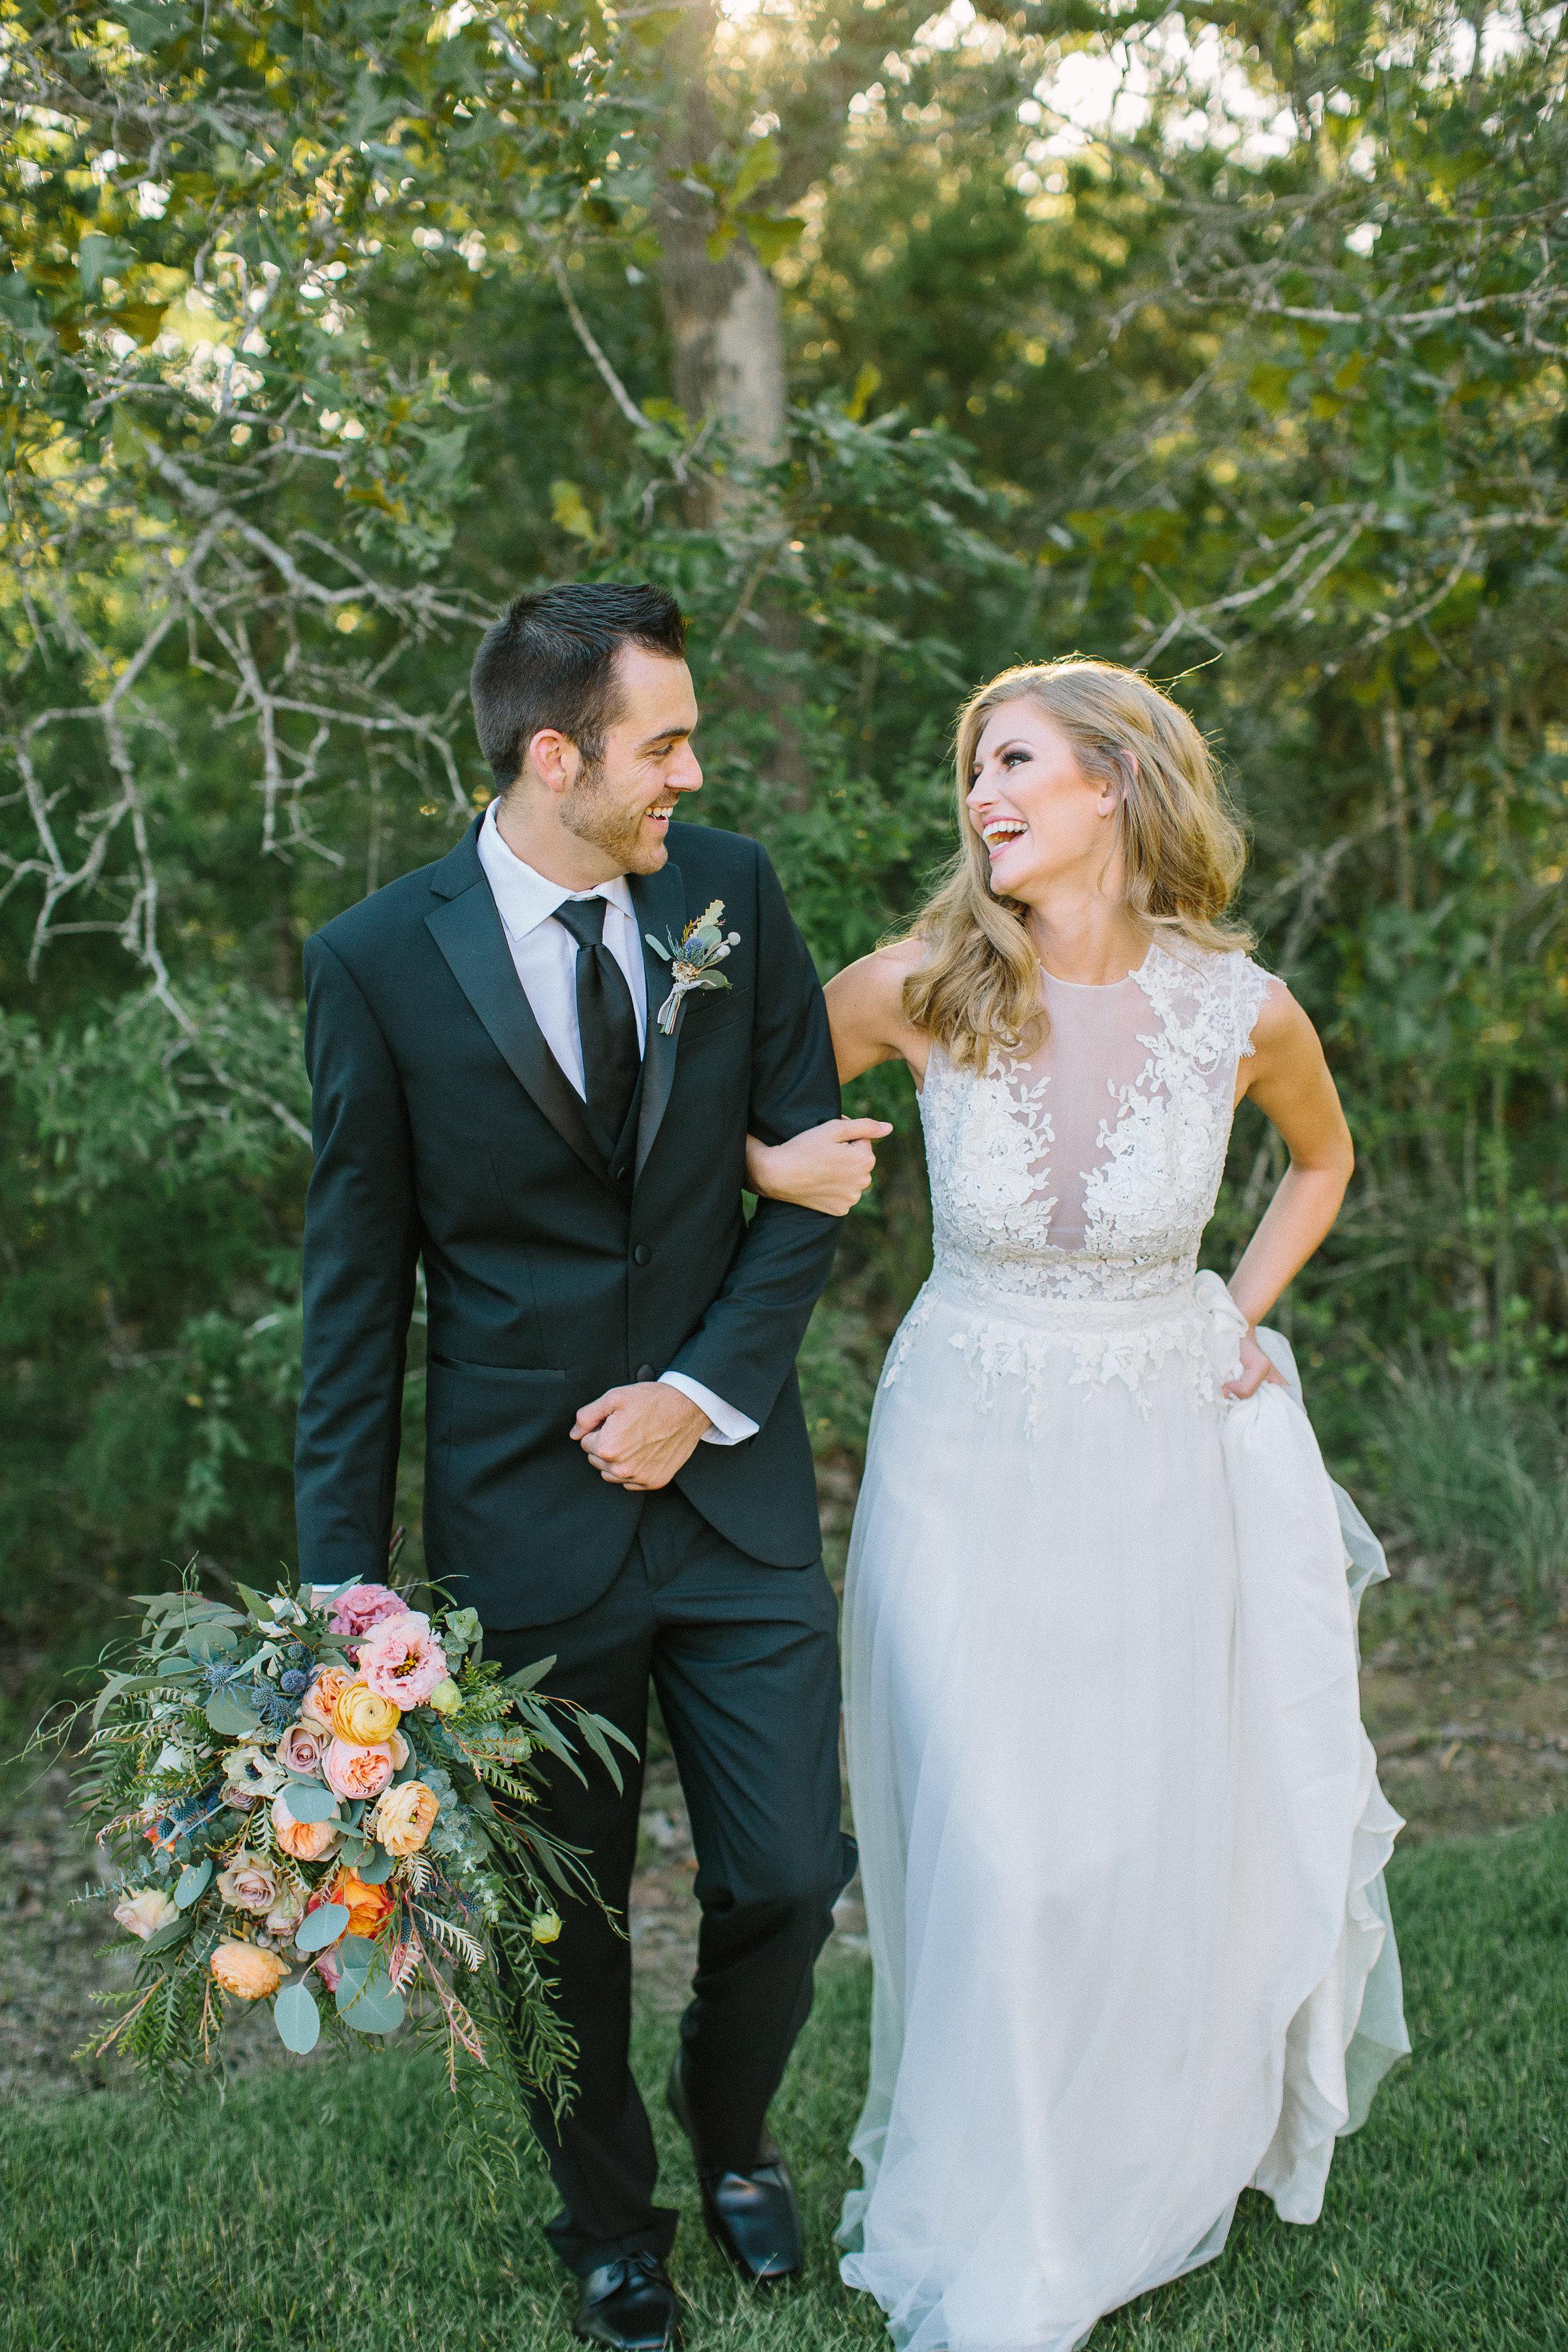 Ellen-Ashton-Photography-Peach-Creek-Ranch-Weddings-Wed-and-Prosper256